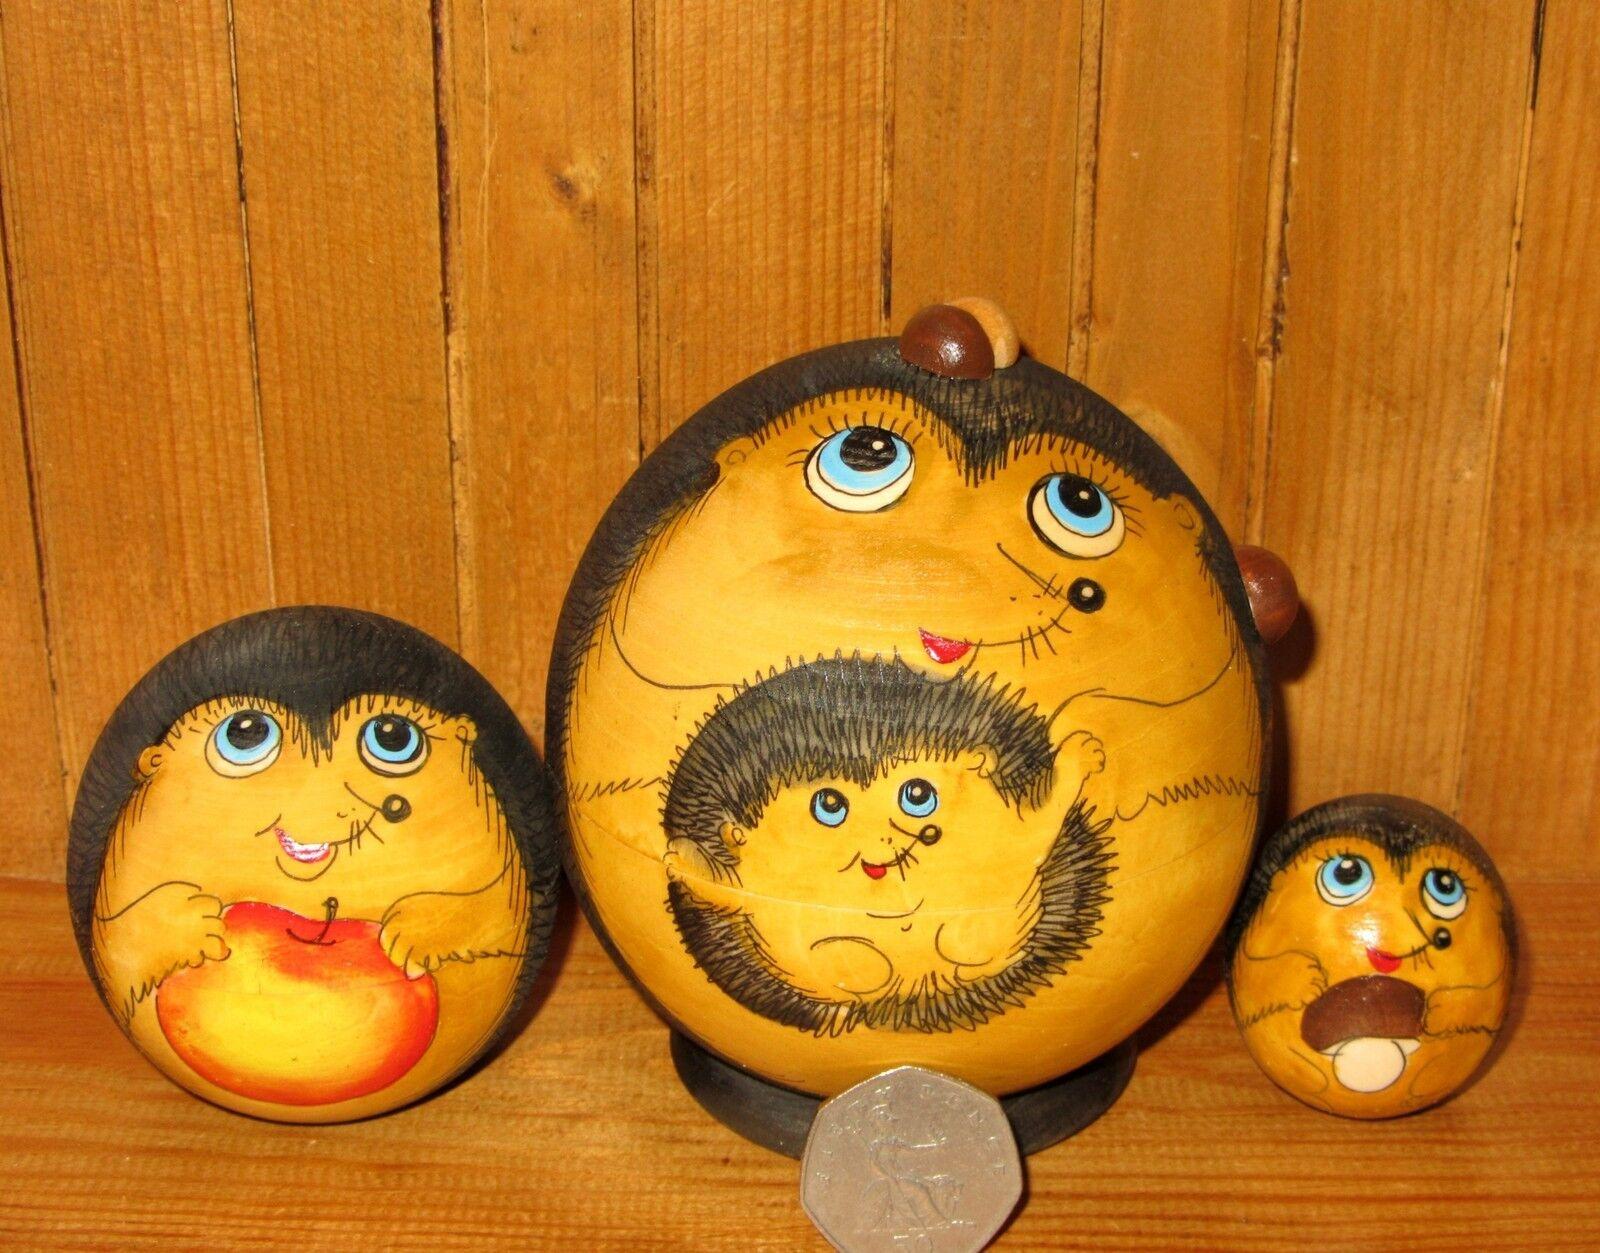 Nesting Russian Dolls Matryoshka Babushka 3 SMALL BALL Hedgehog Family